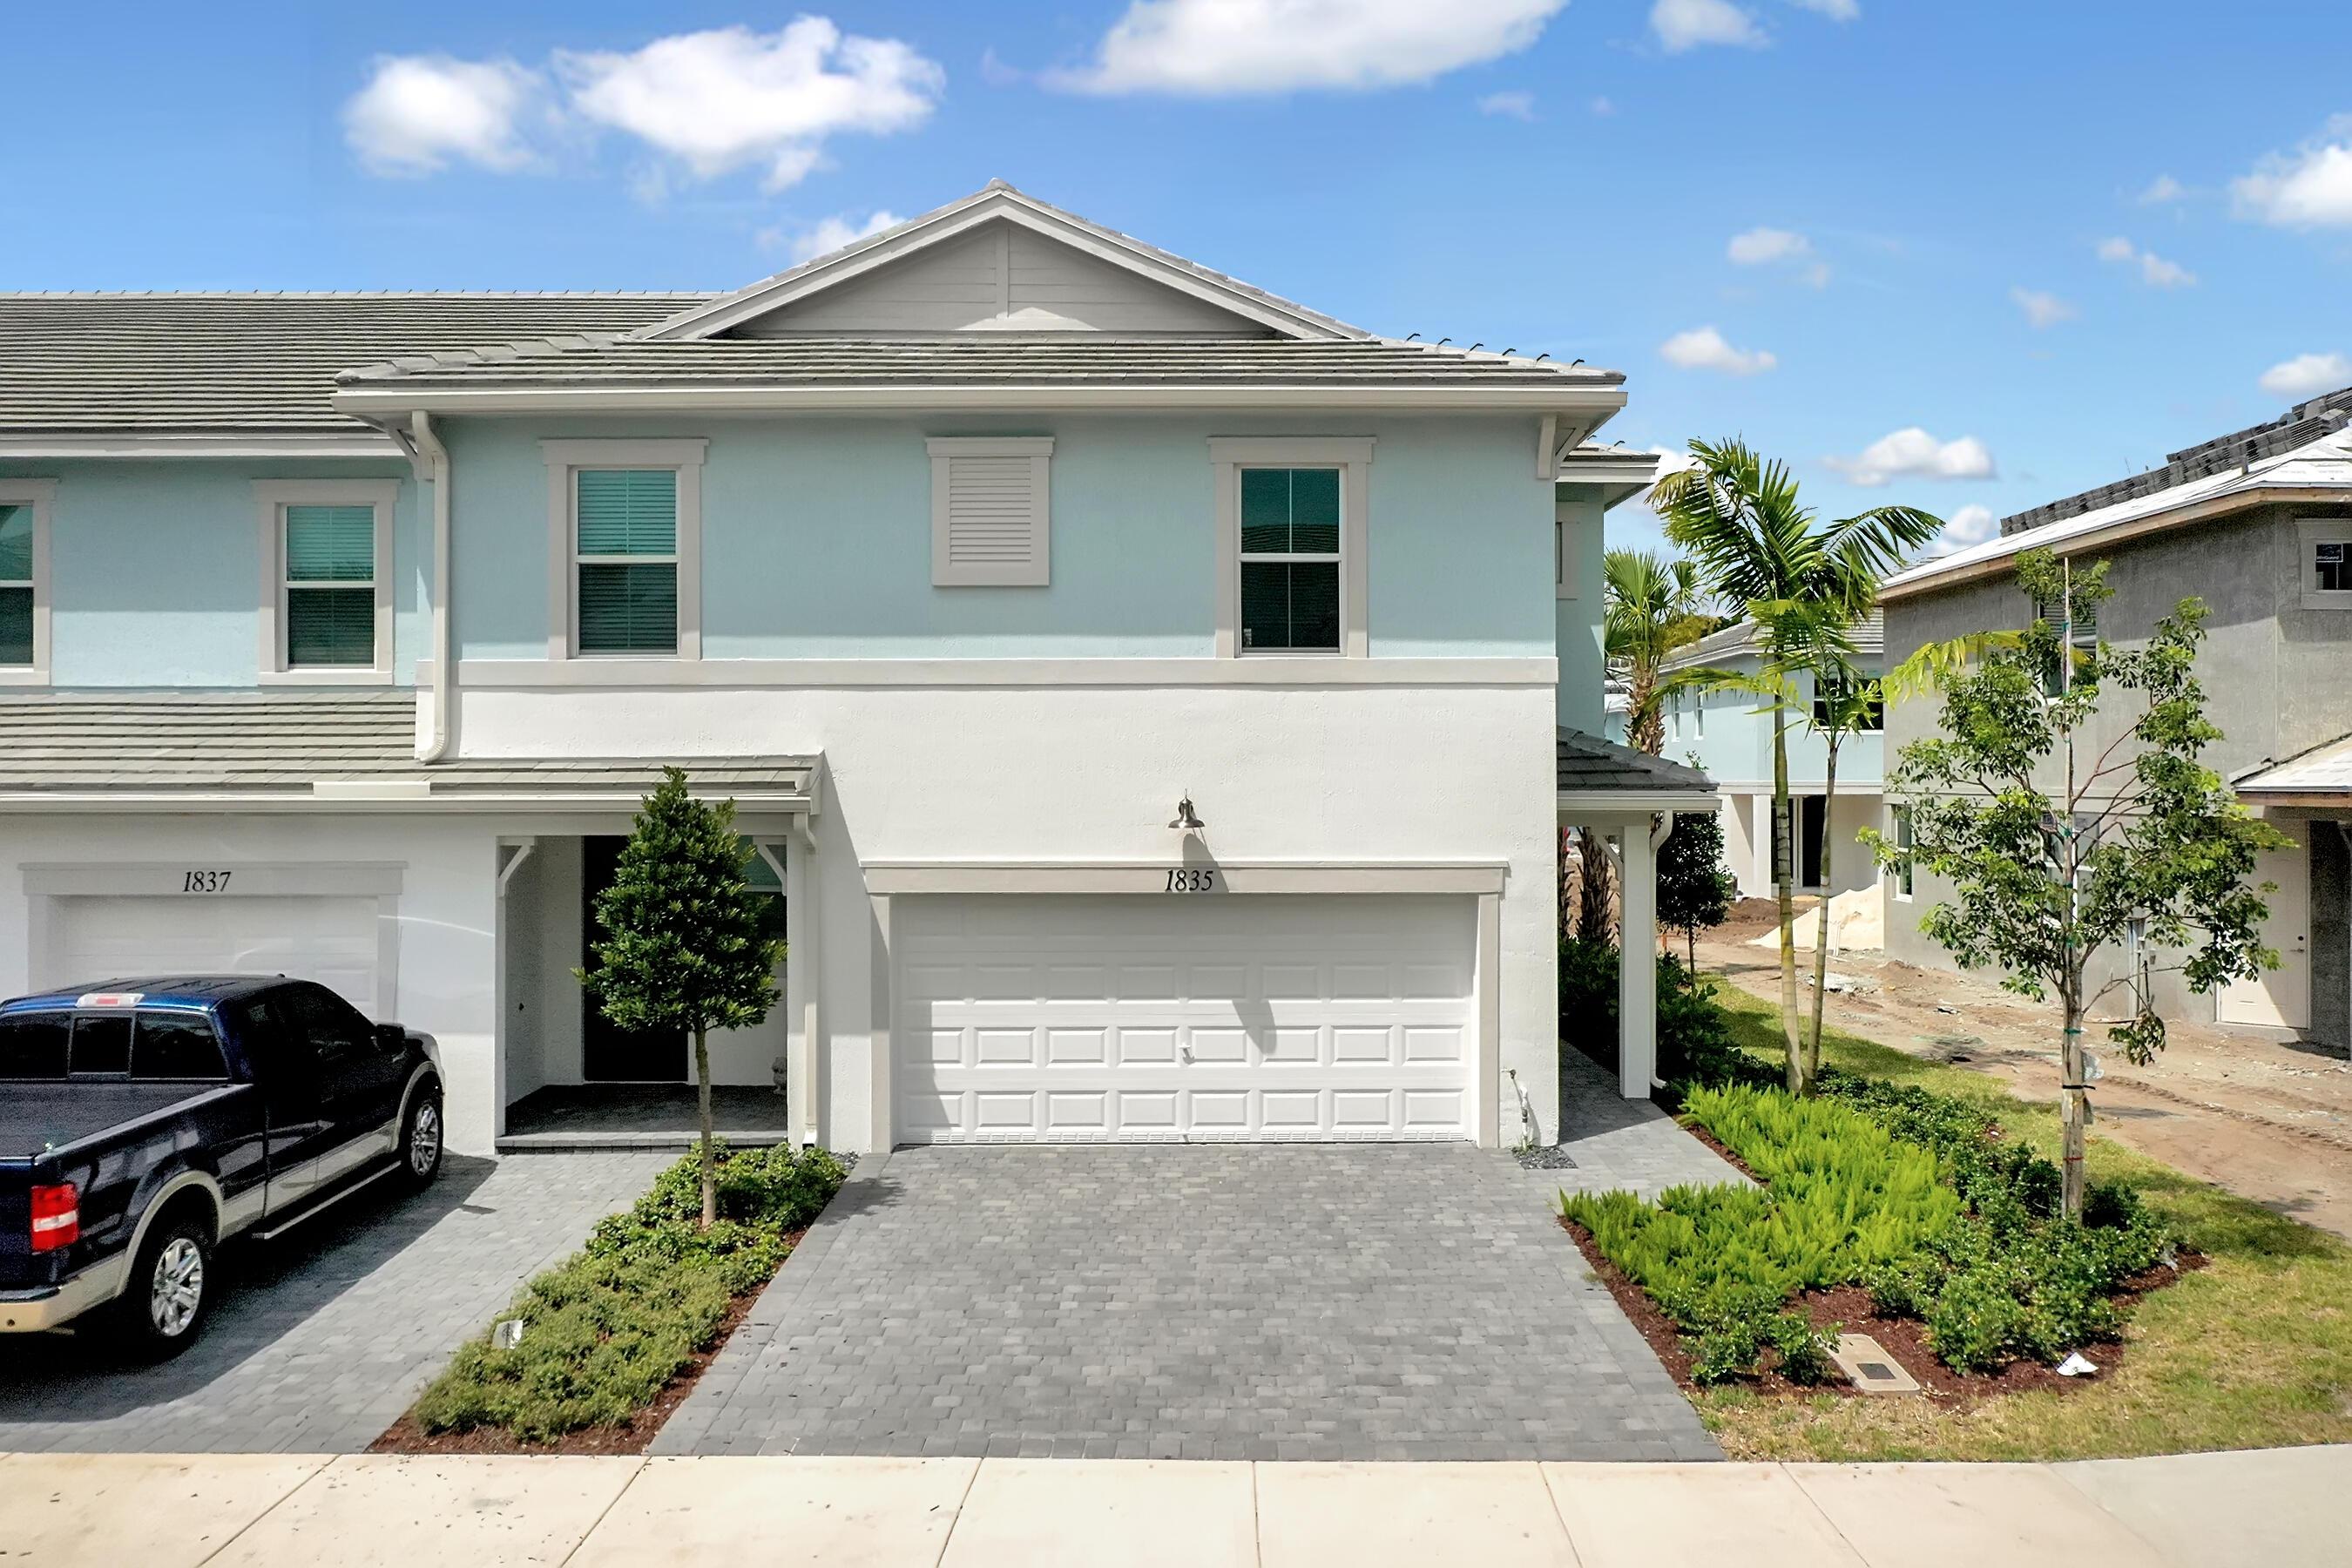 Photo of 1835 Sandpiper Pointe Place, Deerfield Beach, FL 33442